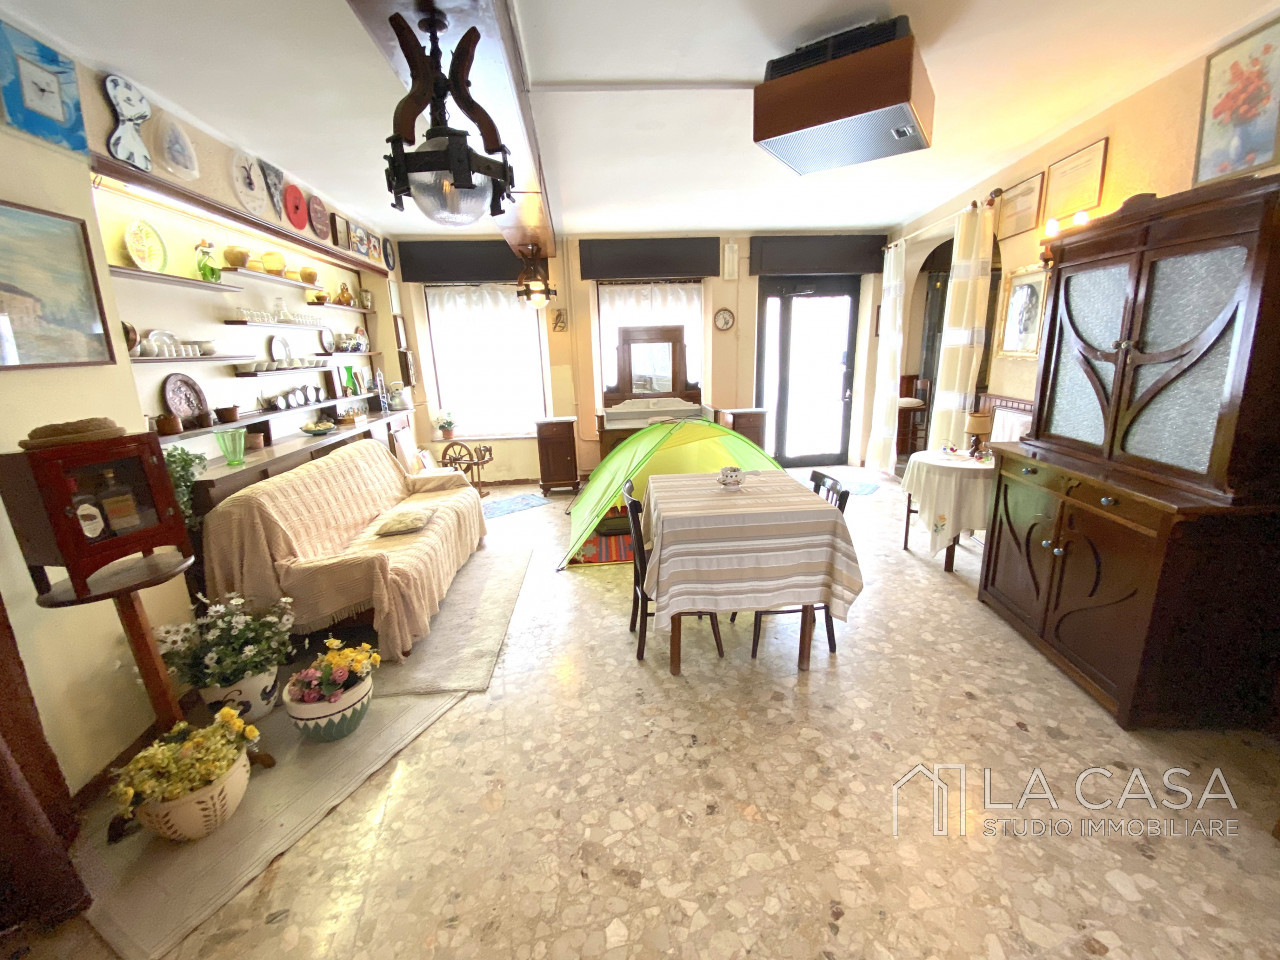 Palazzo plurifamiliare in vendita a Valvasone Arzene - Rif. P3 https://images.gestionaleimmobiliare.it/foto/annunci/200827/2284141/1280x1280/003__img_3704_wmk_0.jpg